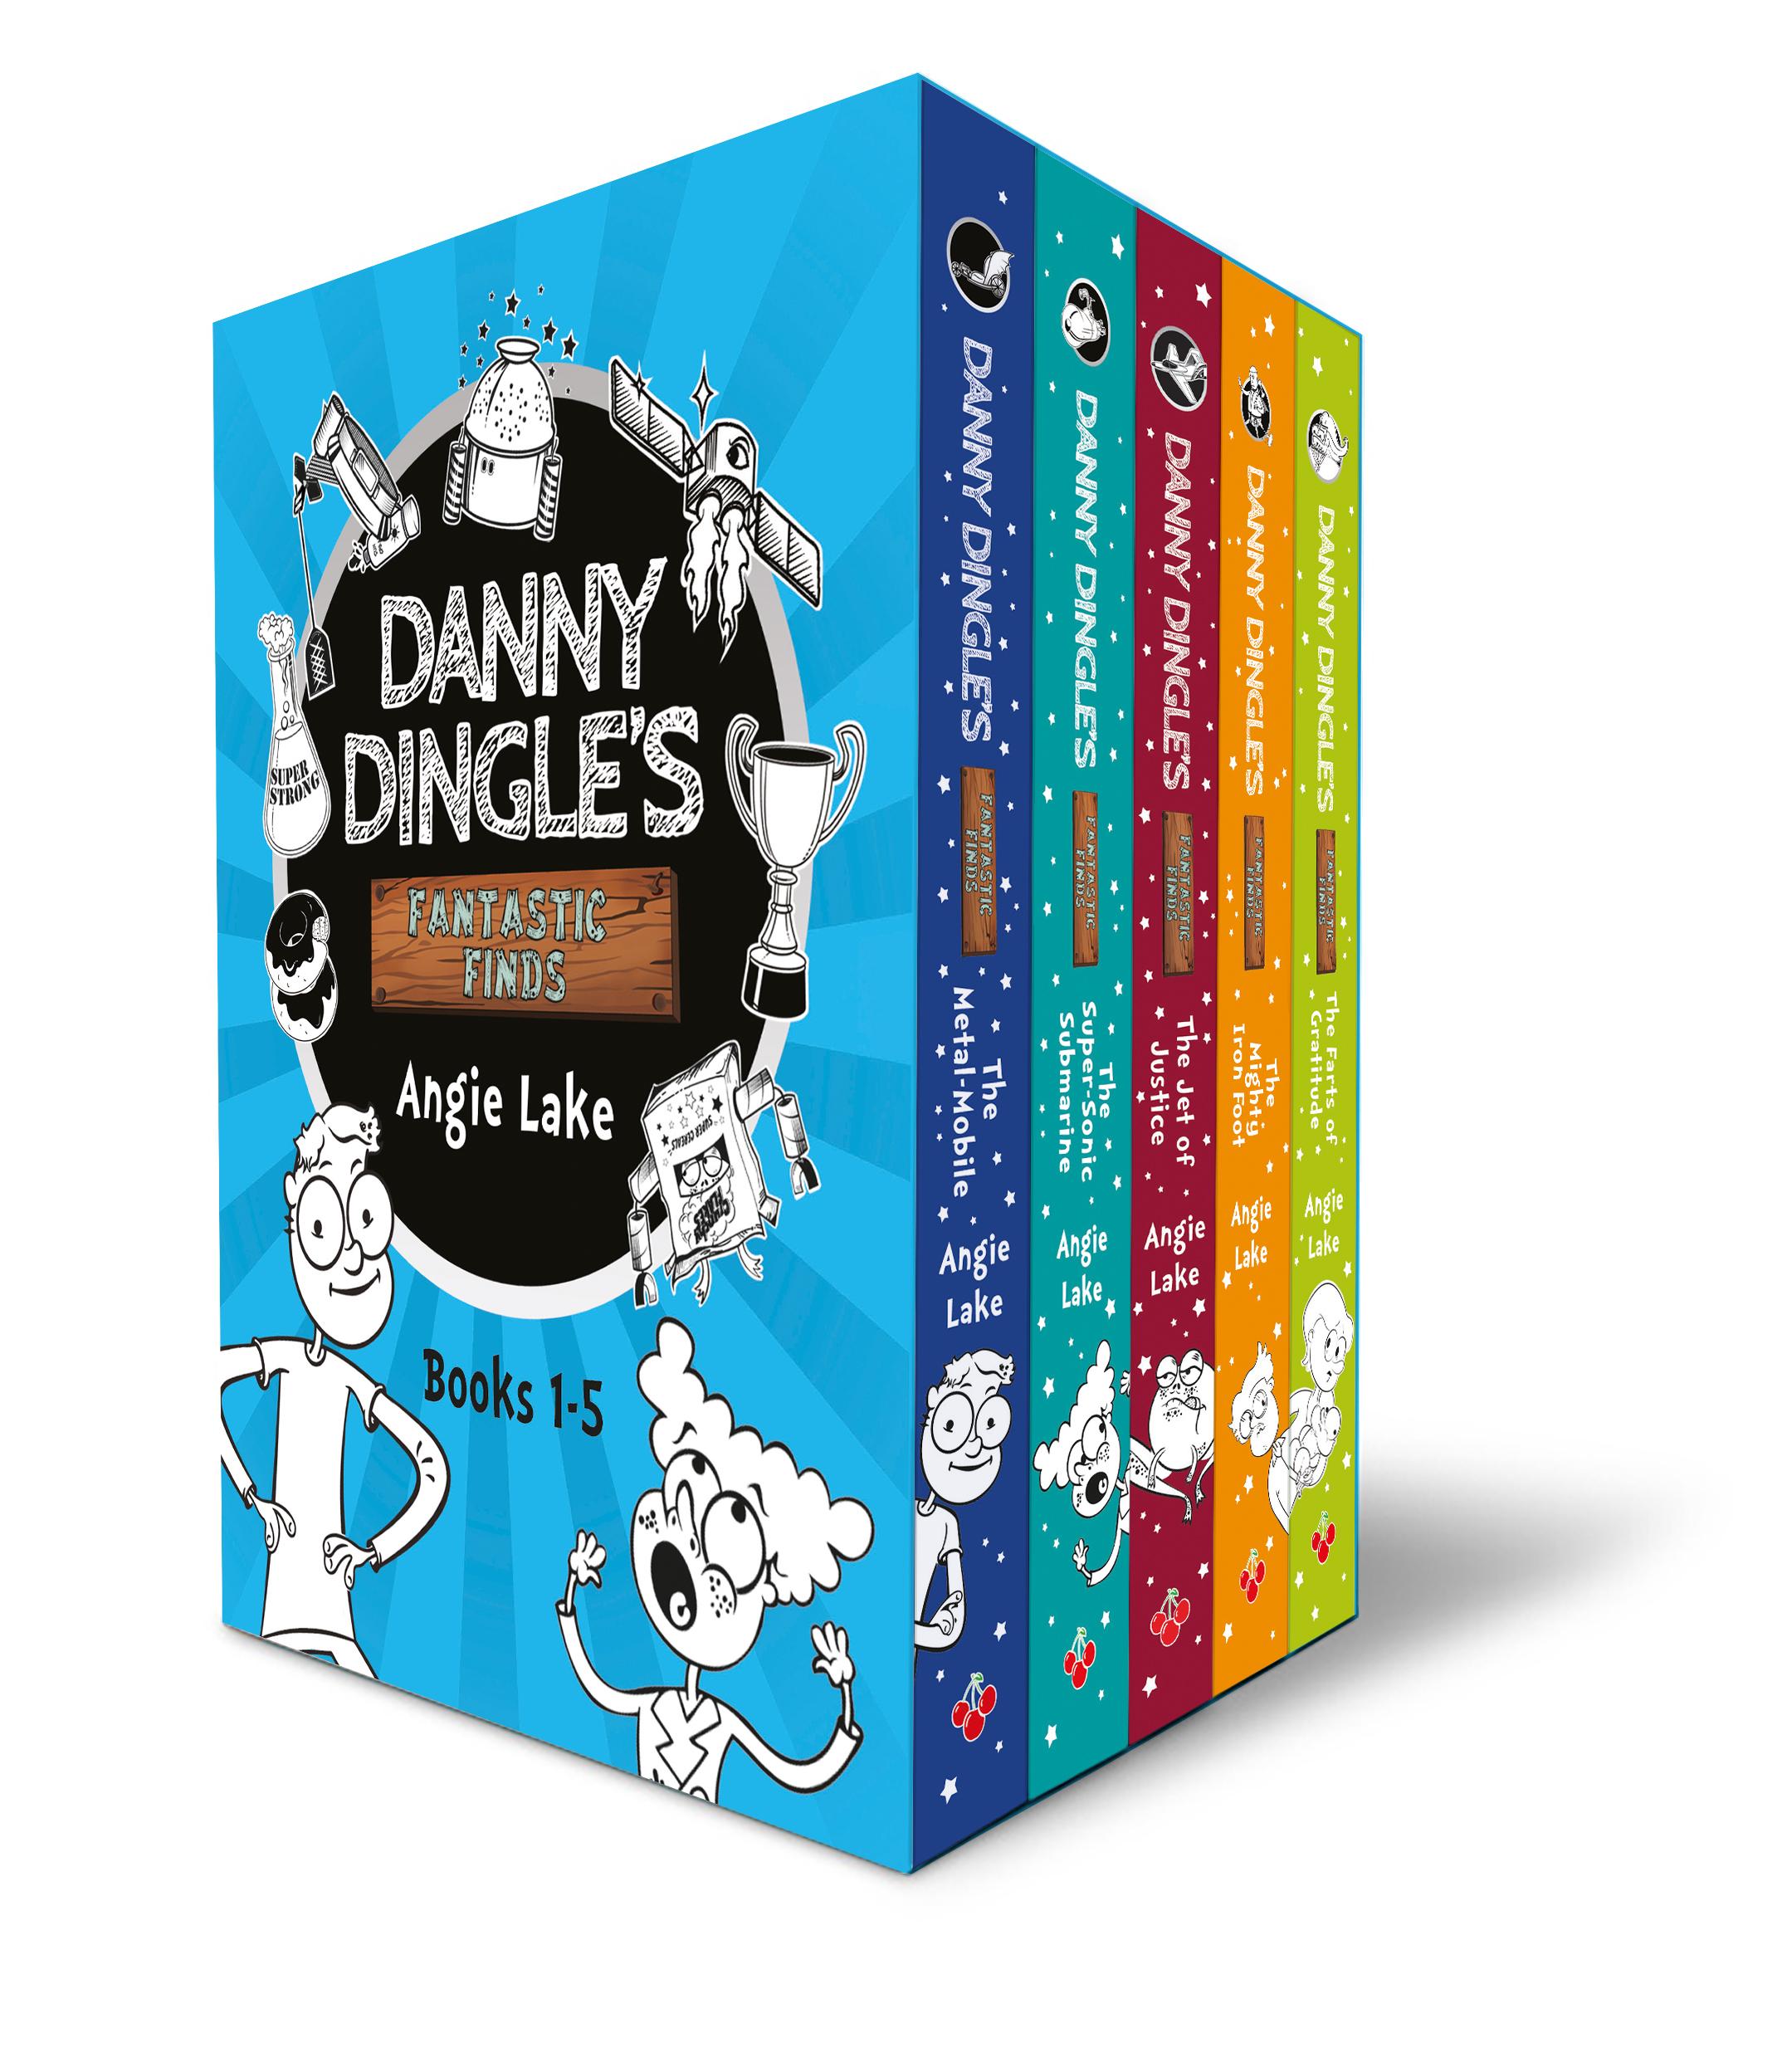 Danny Dingle's Fantastic Finds five book box set